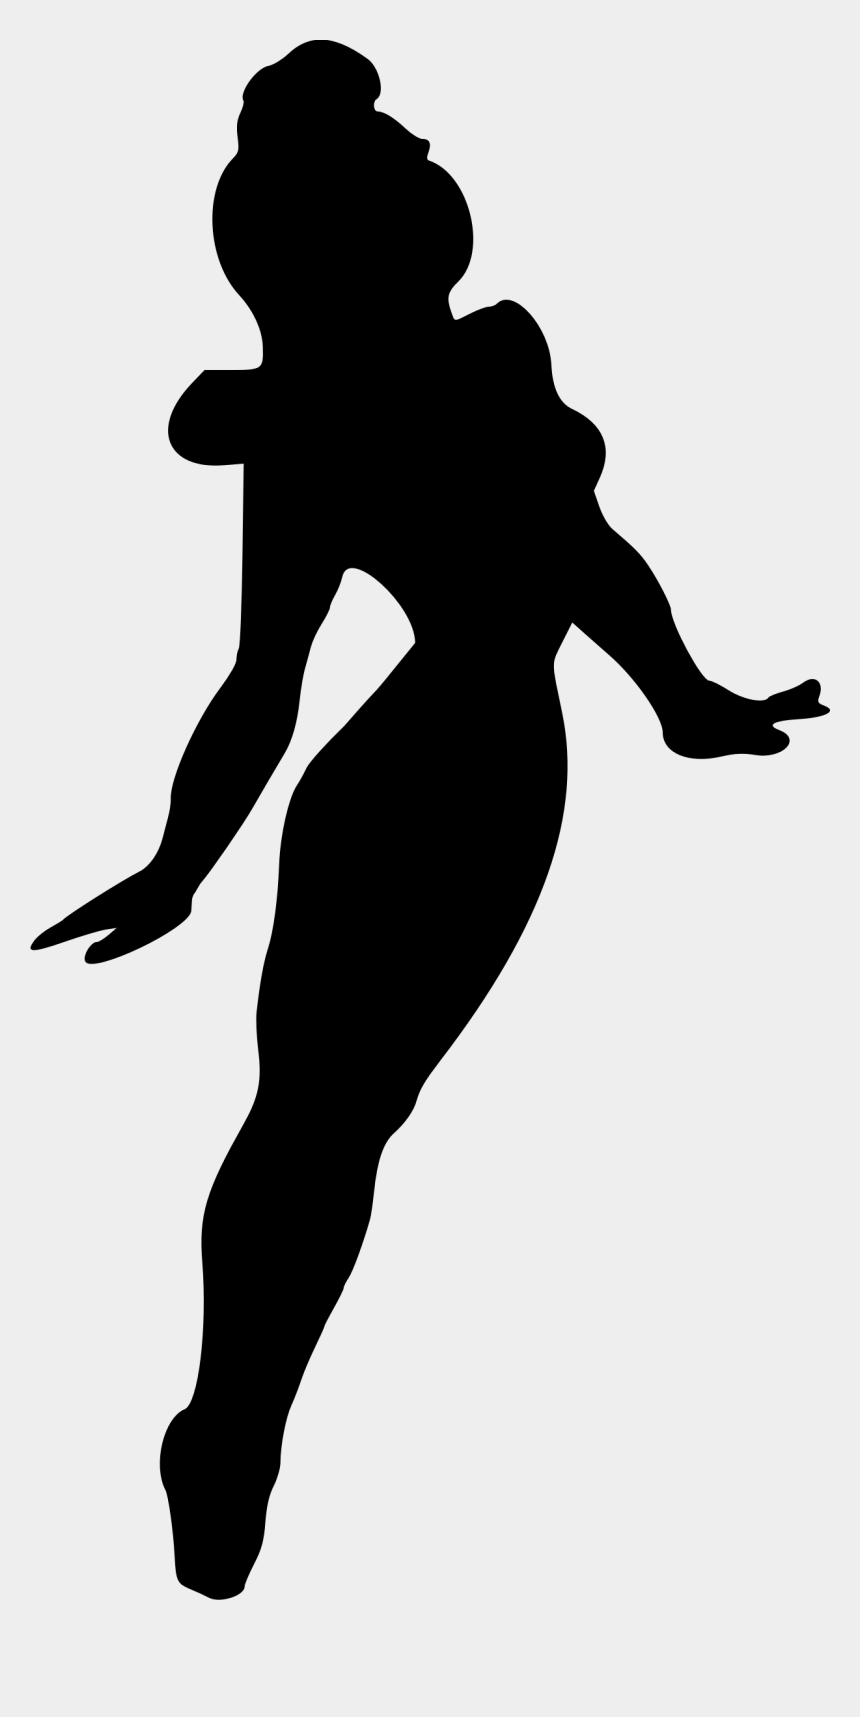 line dancers clipart, Cartoons - Woman Dancing Silhouette - Portable Network Graphics